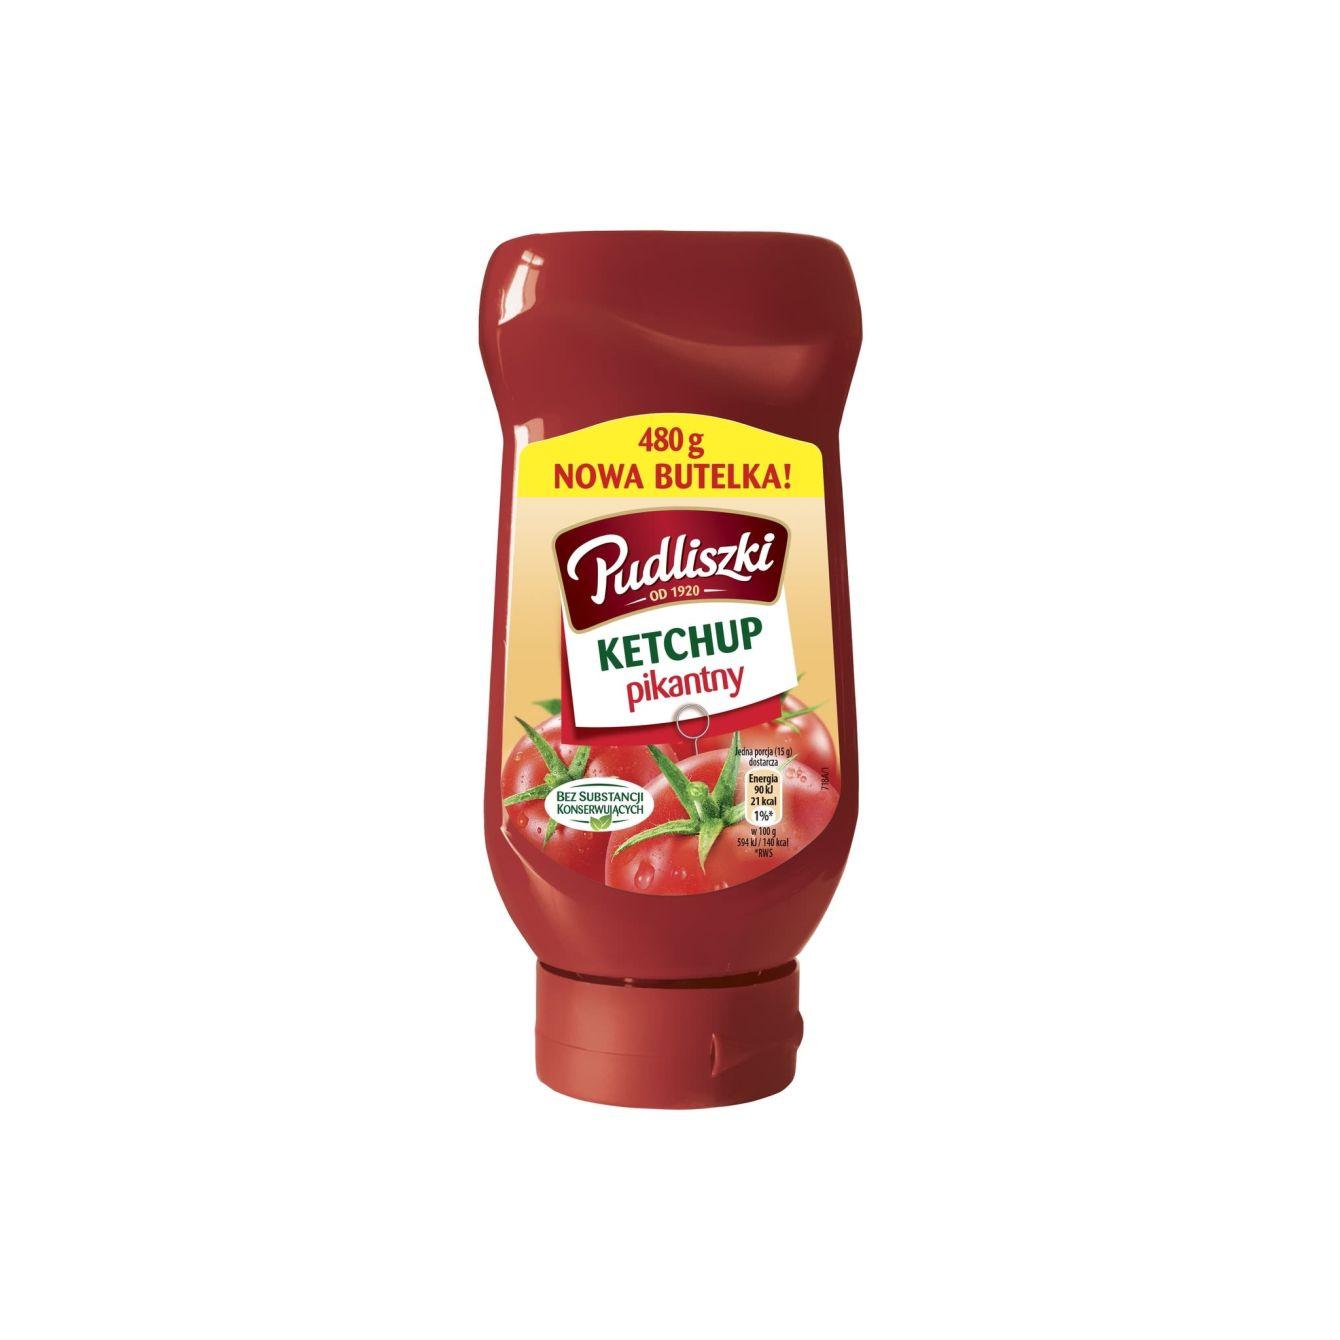 Pudliszki Ketchup Pikant